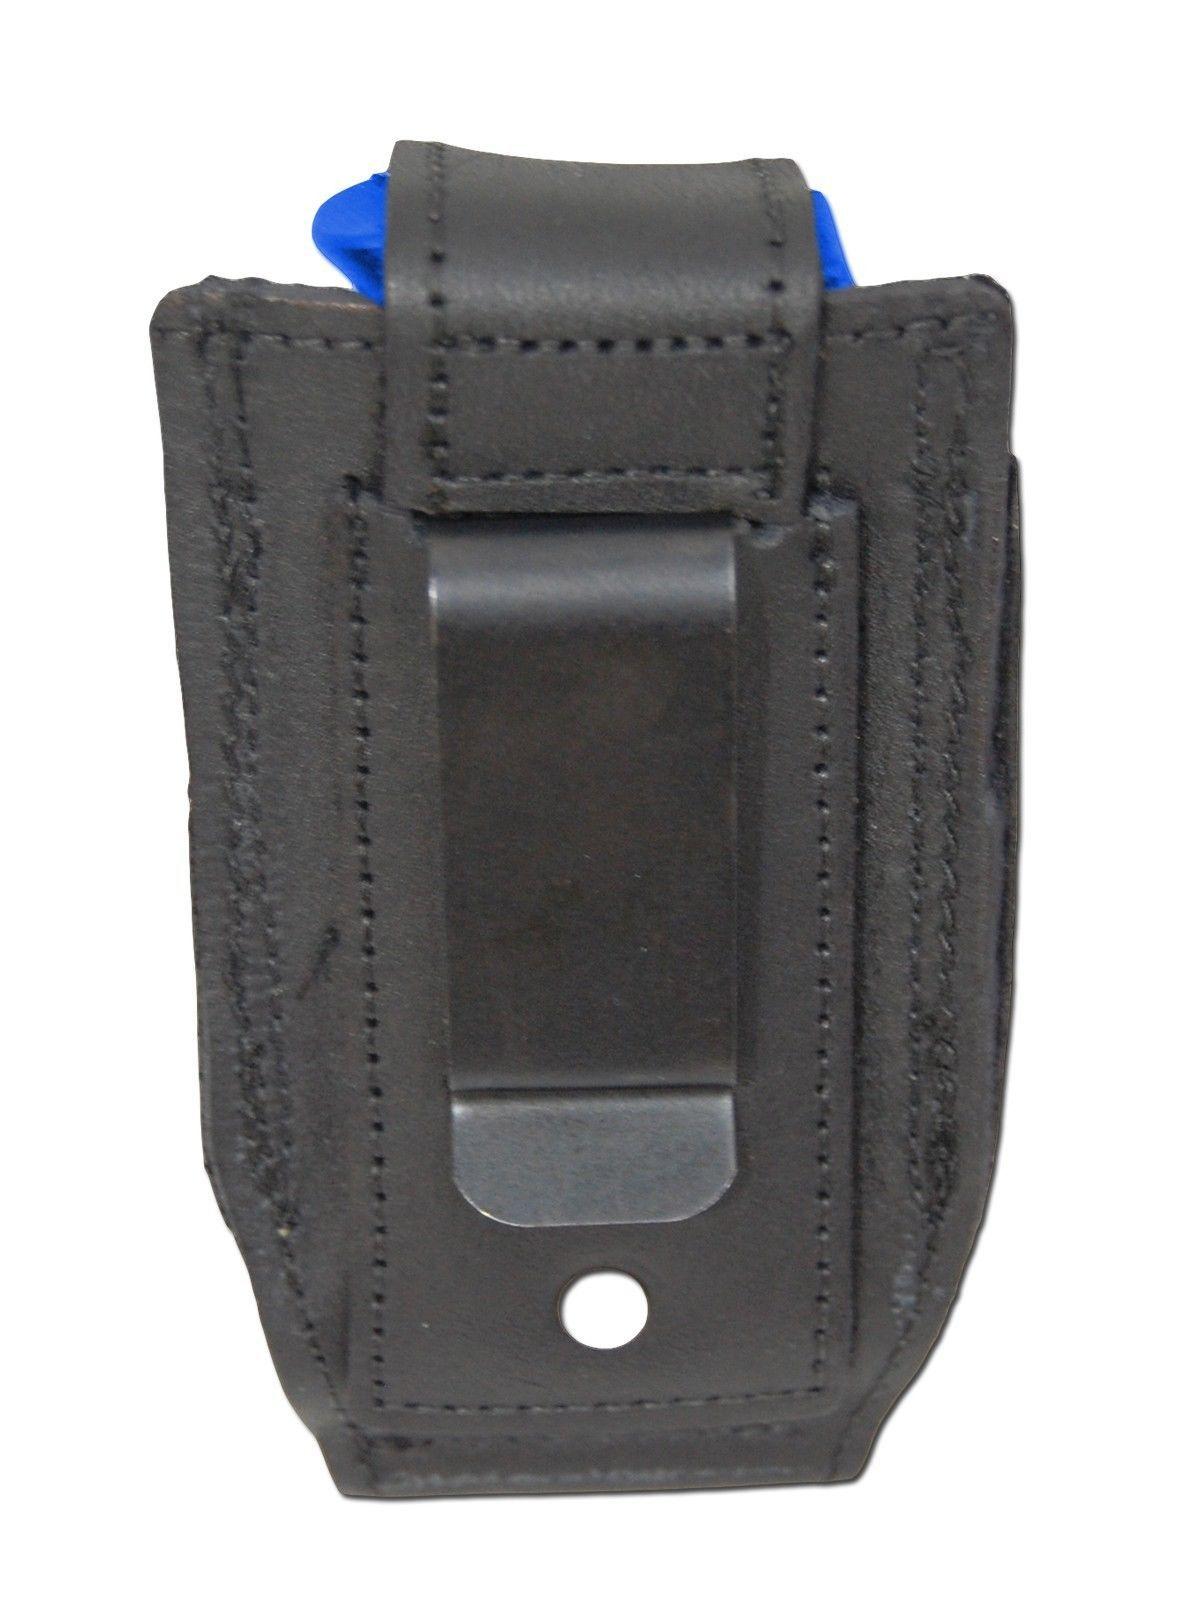 NEW Barsony Black Leather Single Mag Pouch for Cobra, EAA Mini/Pocket 22 25 380